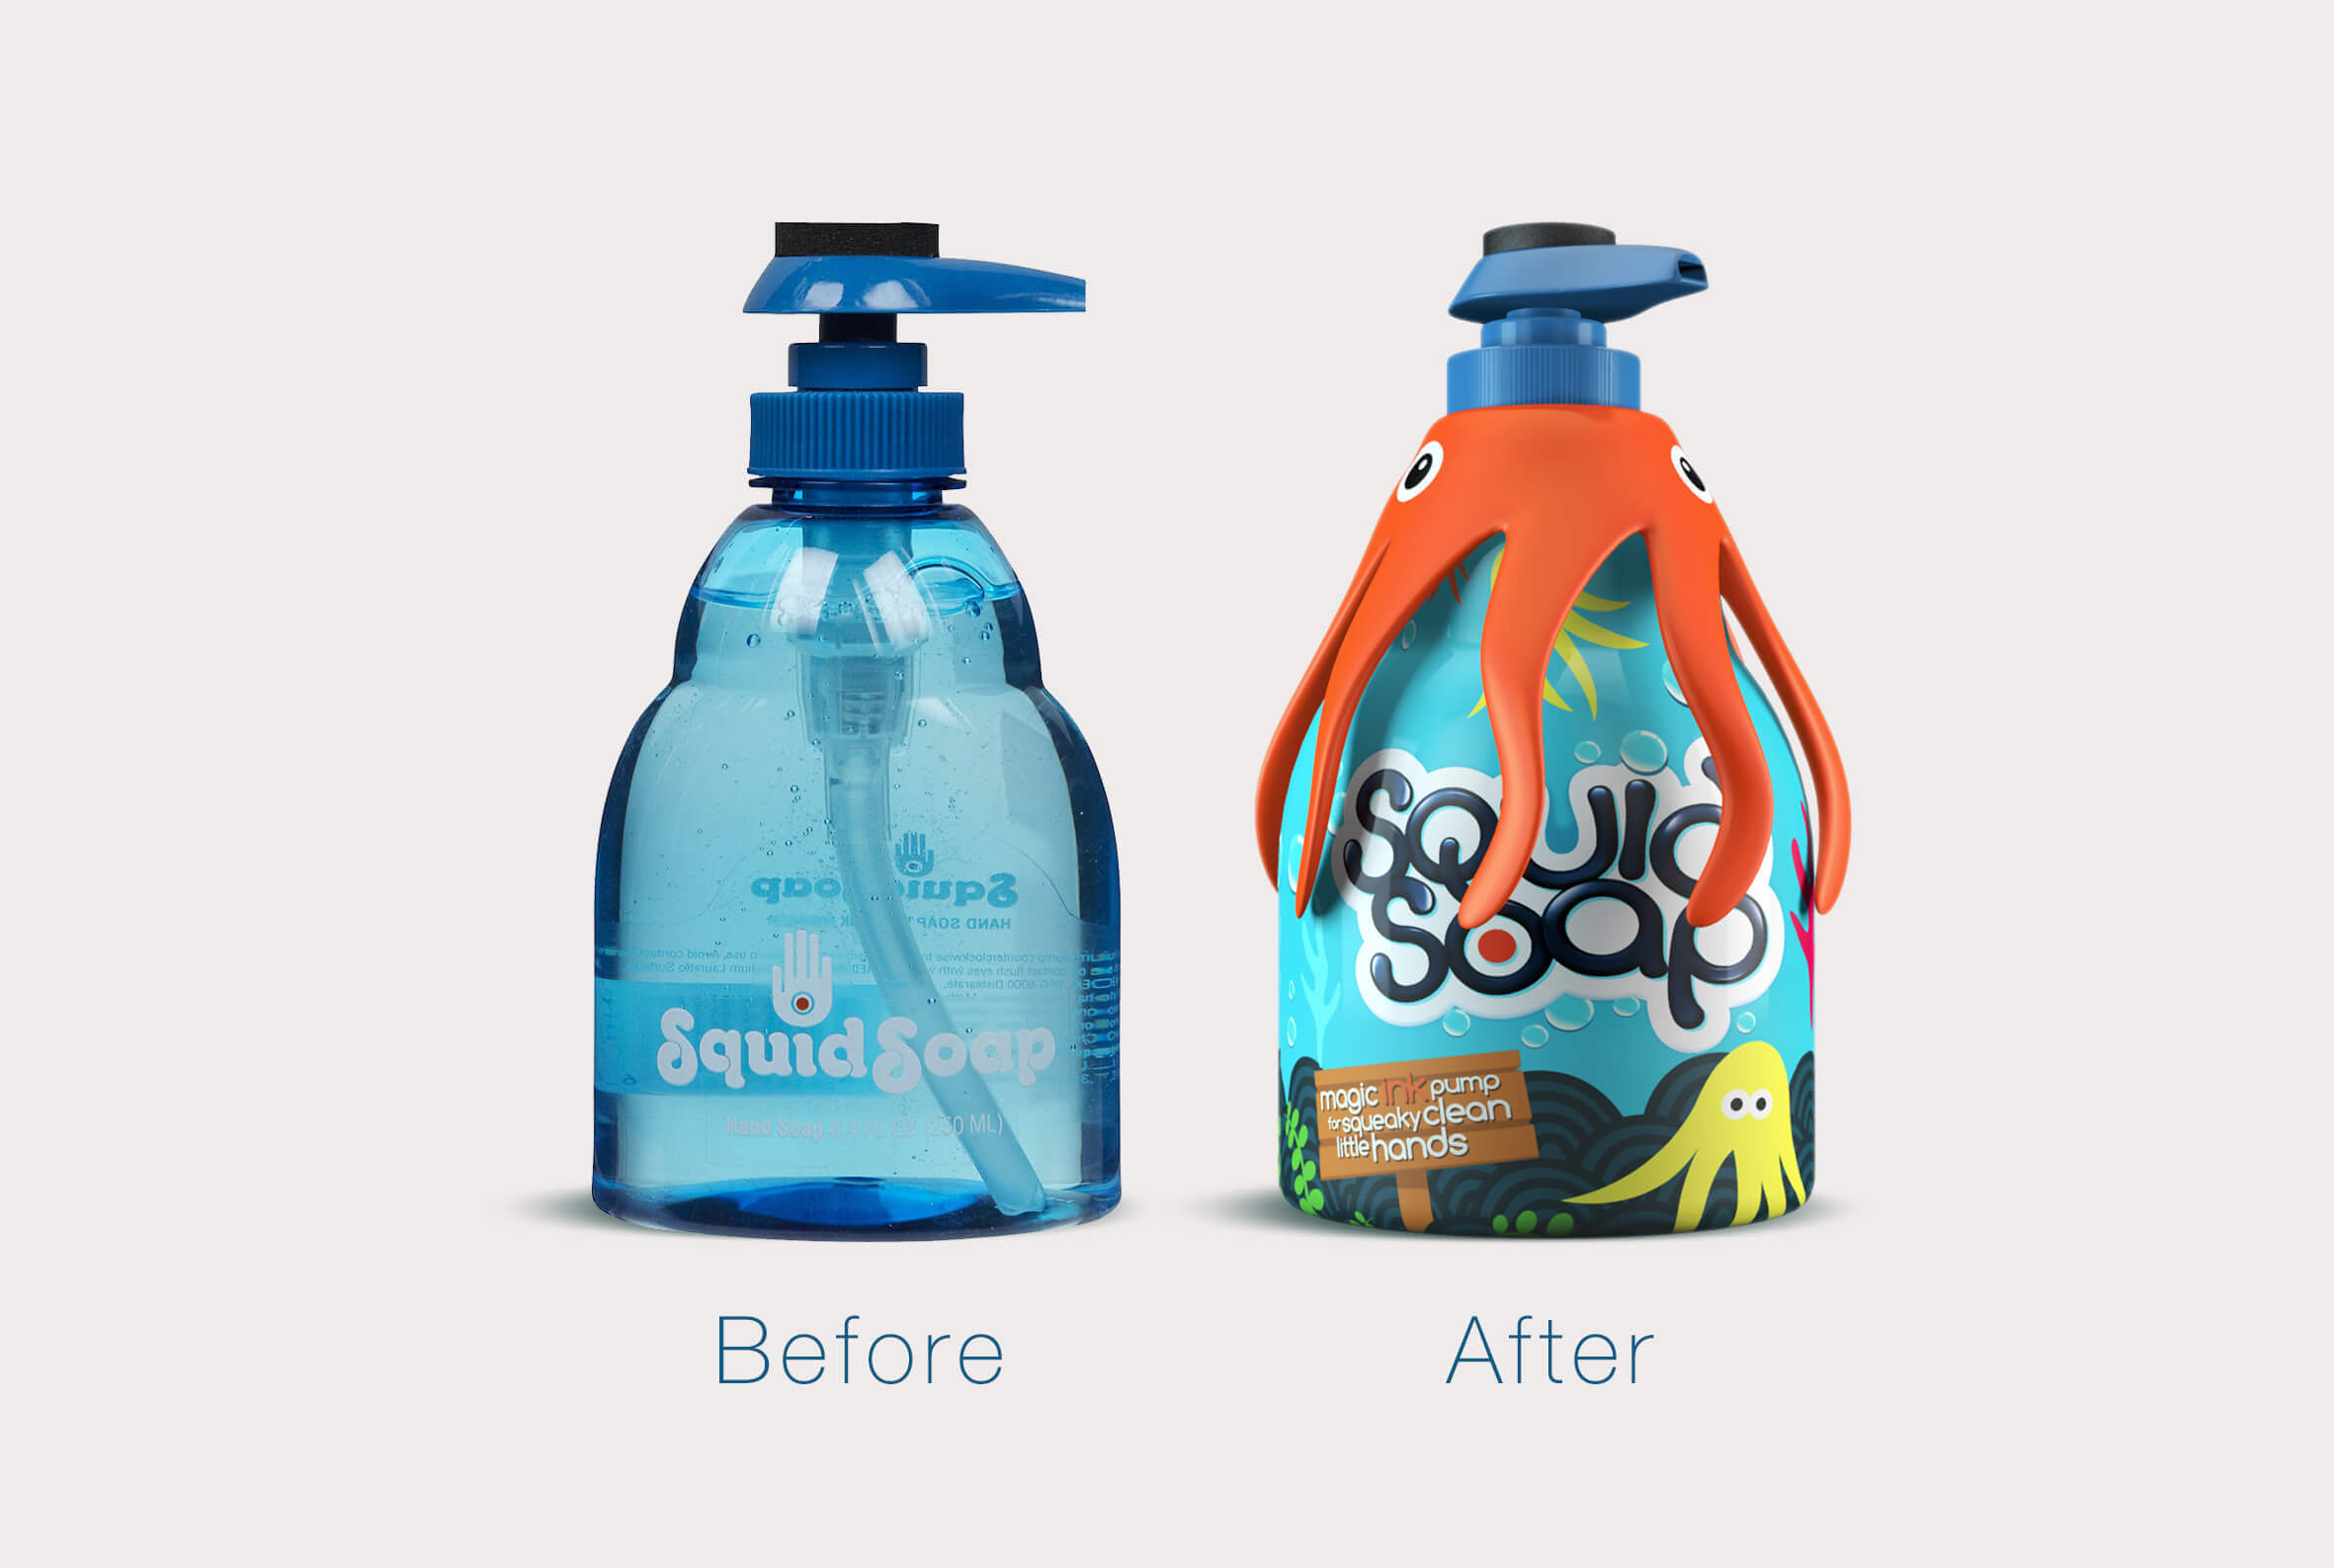 Squid Soap kids branding and packaging design